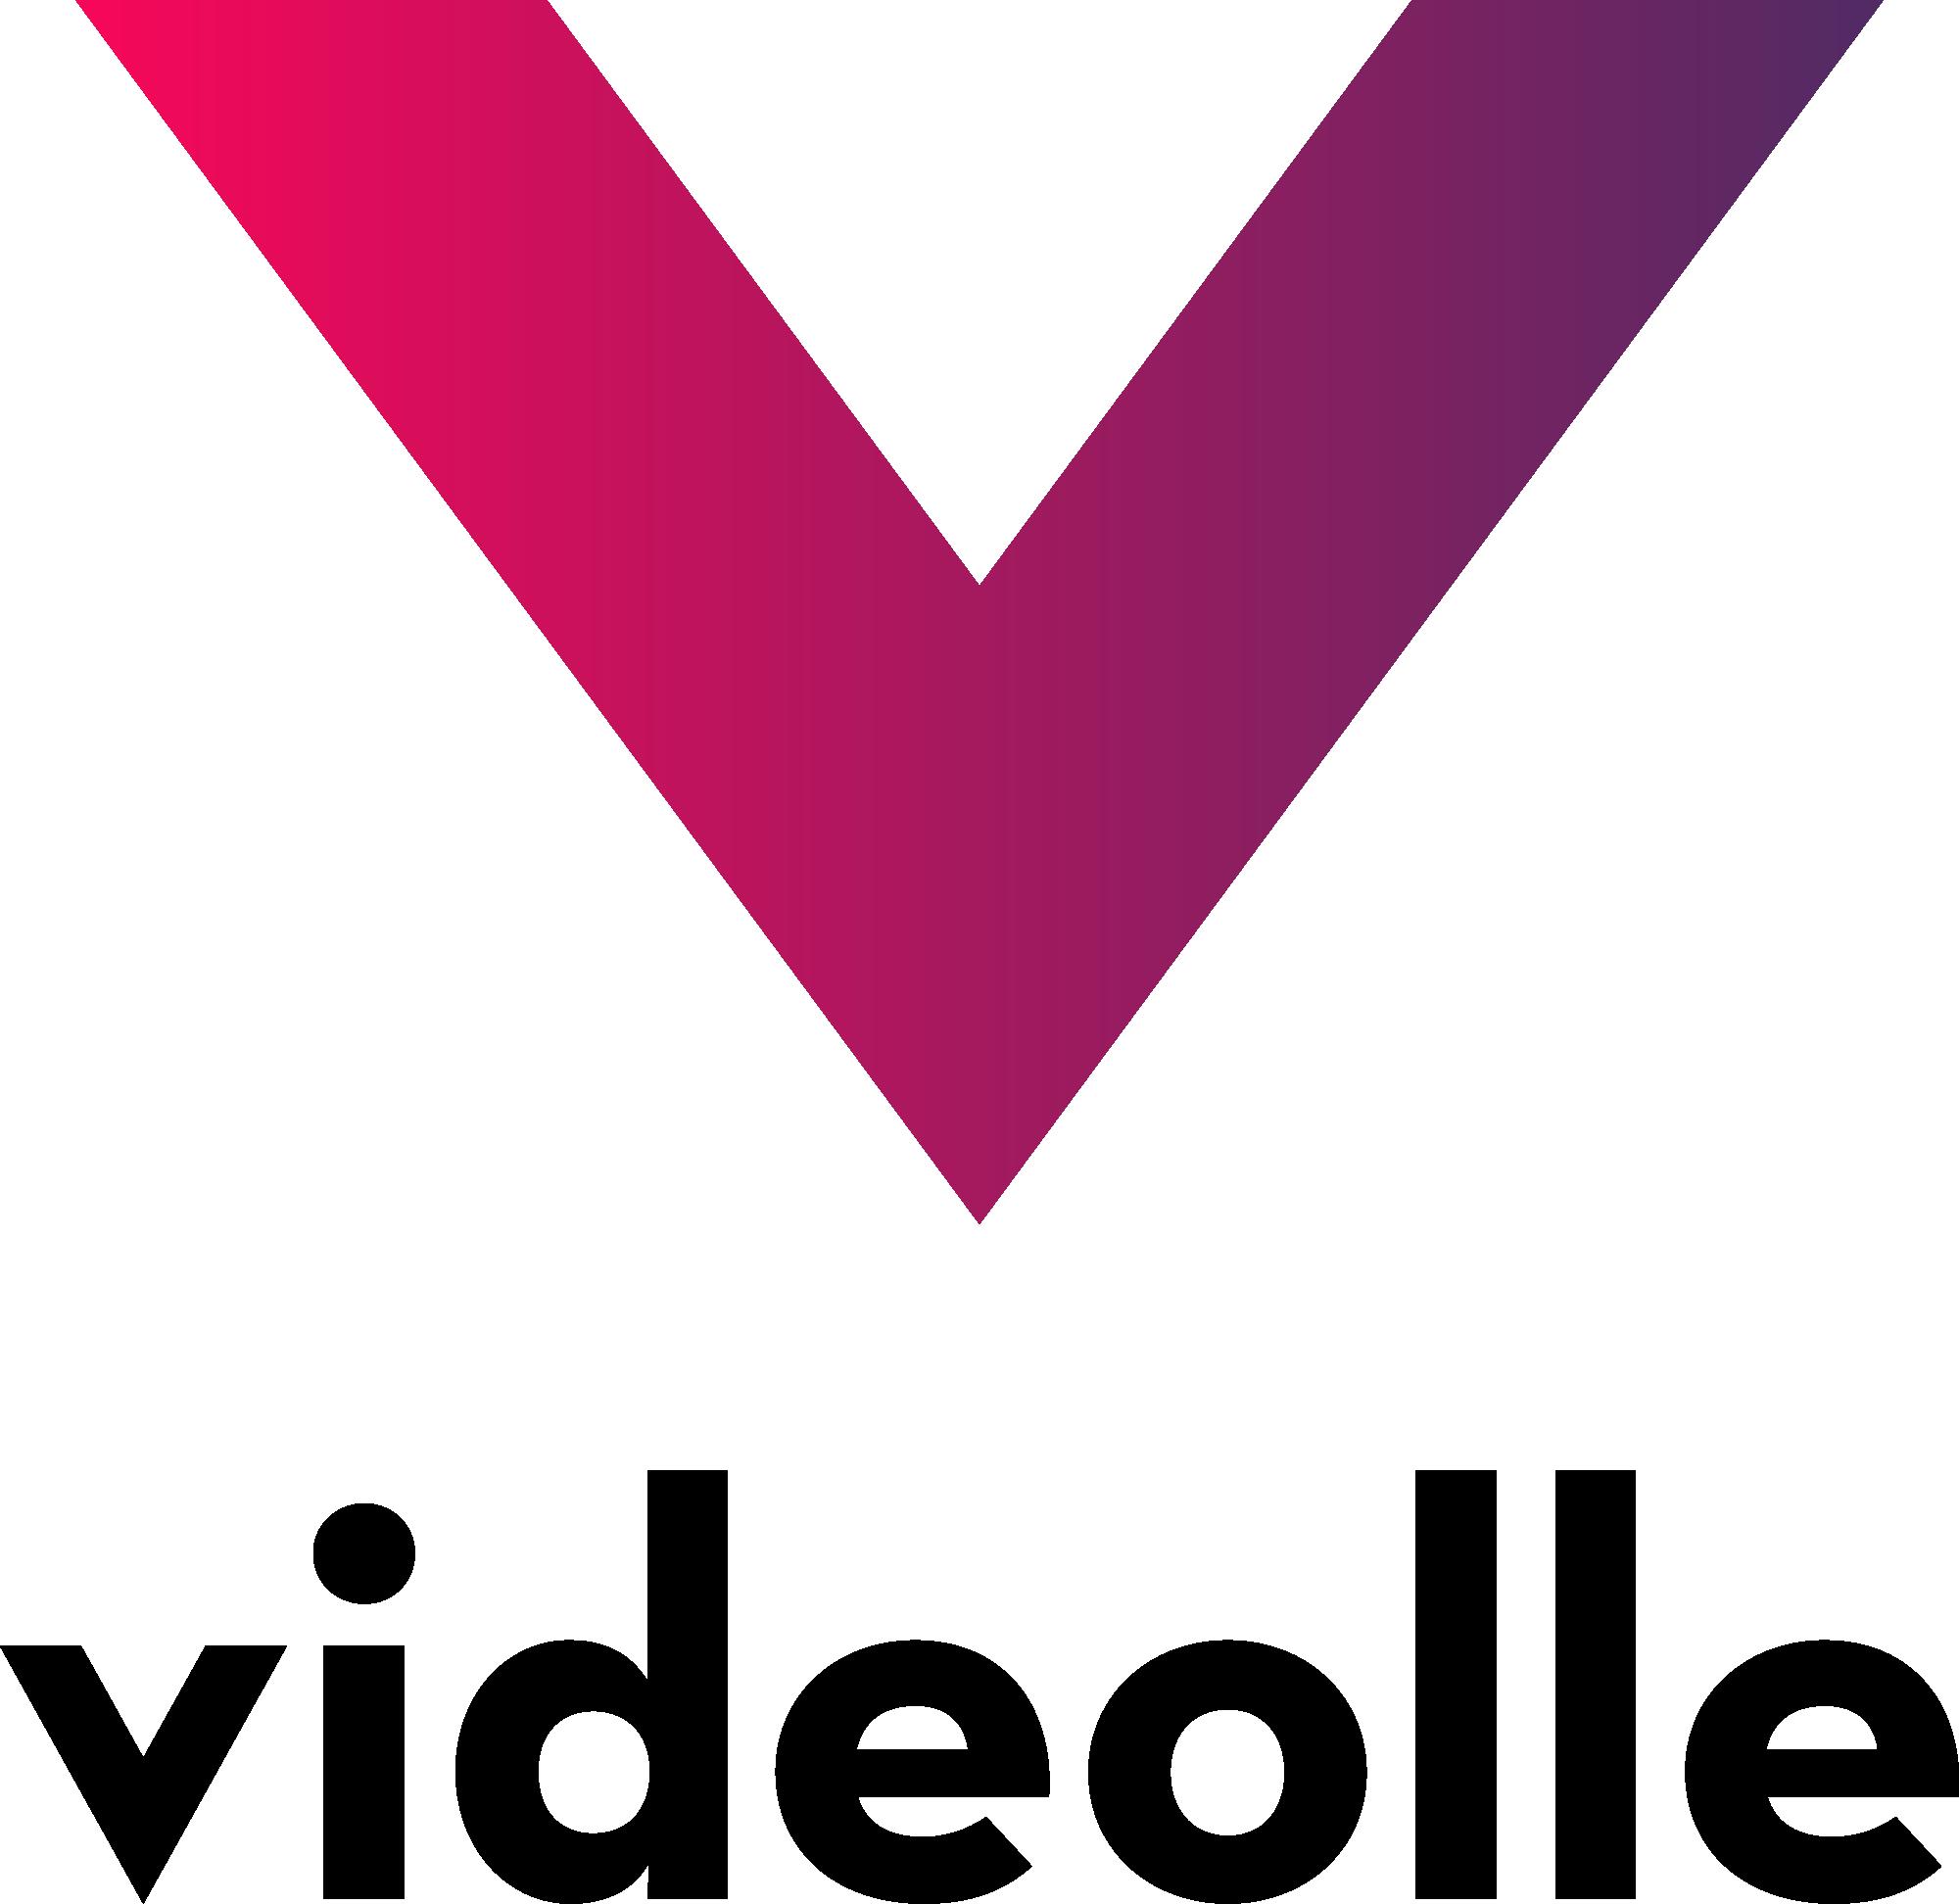 Videolle2018_logo_neliö5